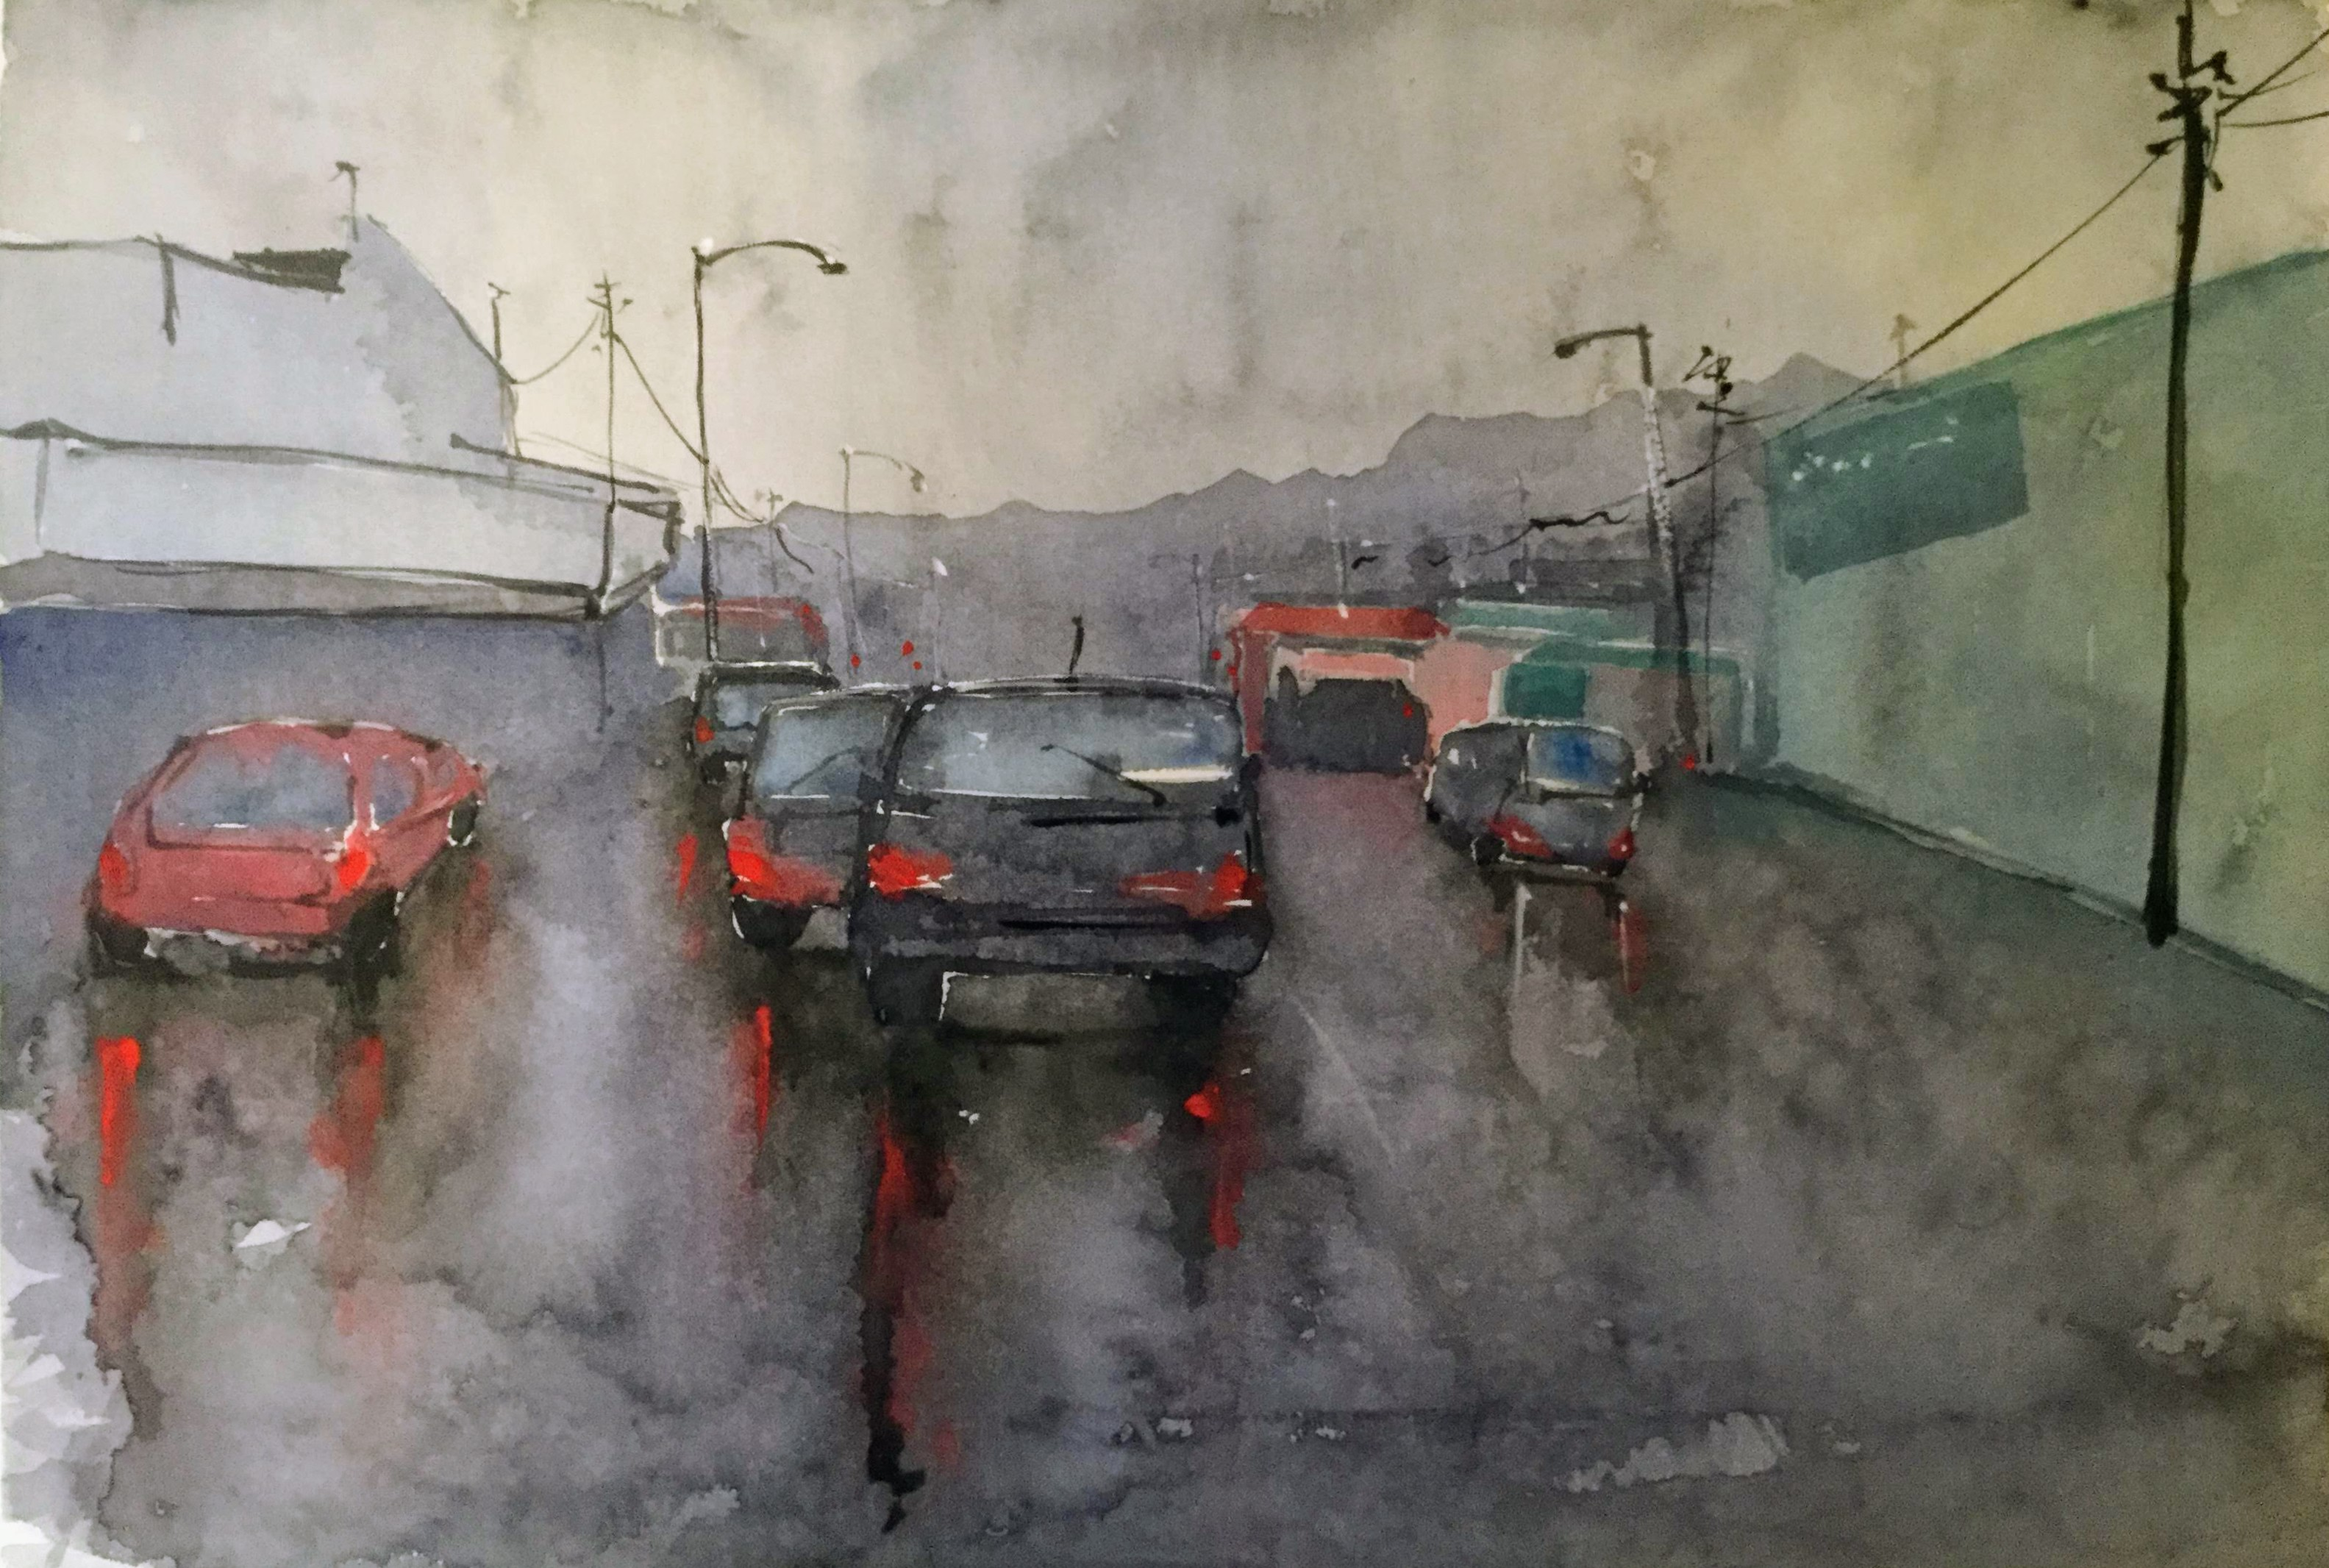 A Soaking Day - Lower Hutt